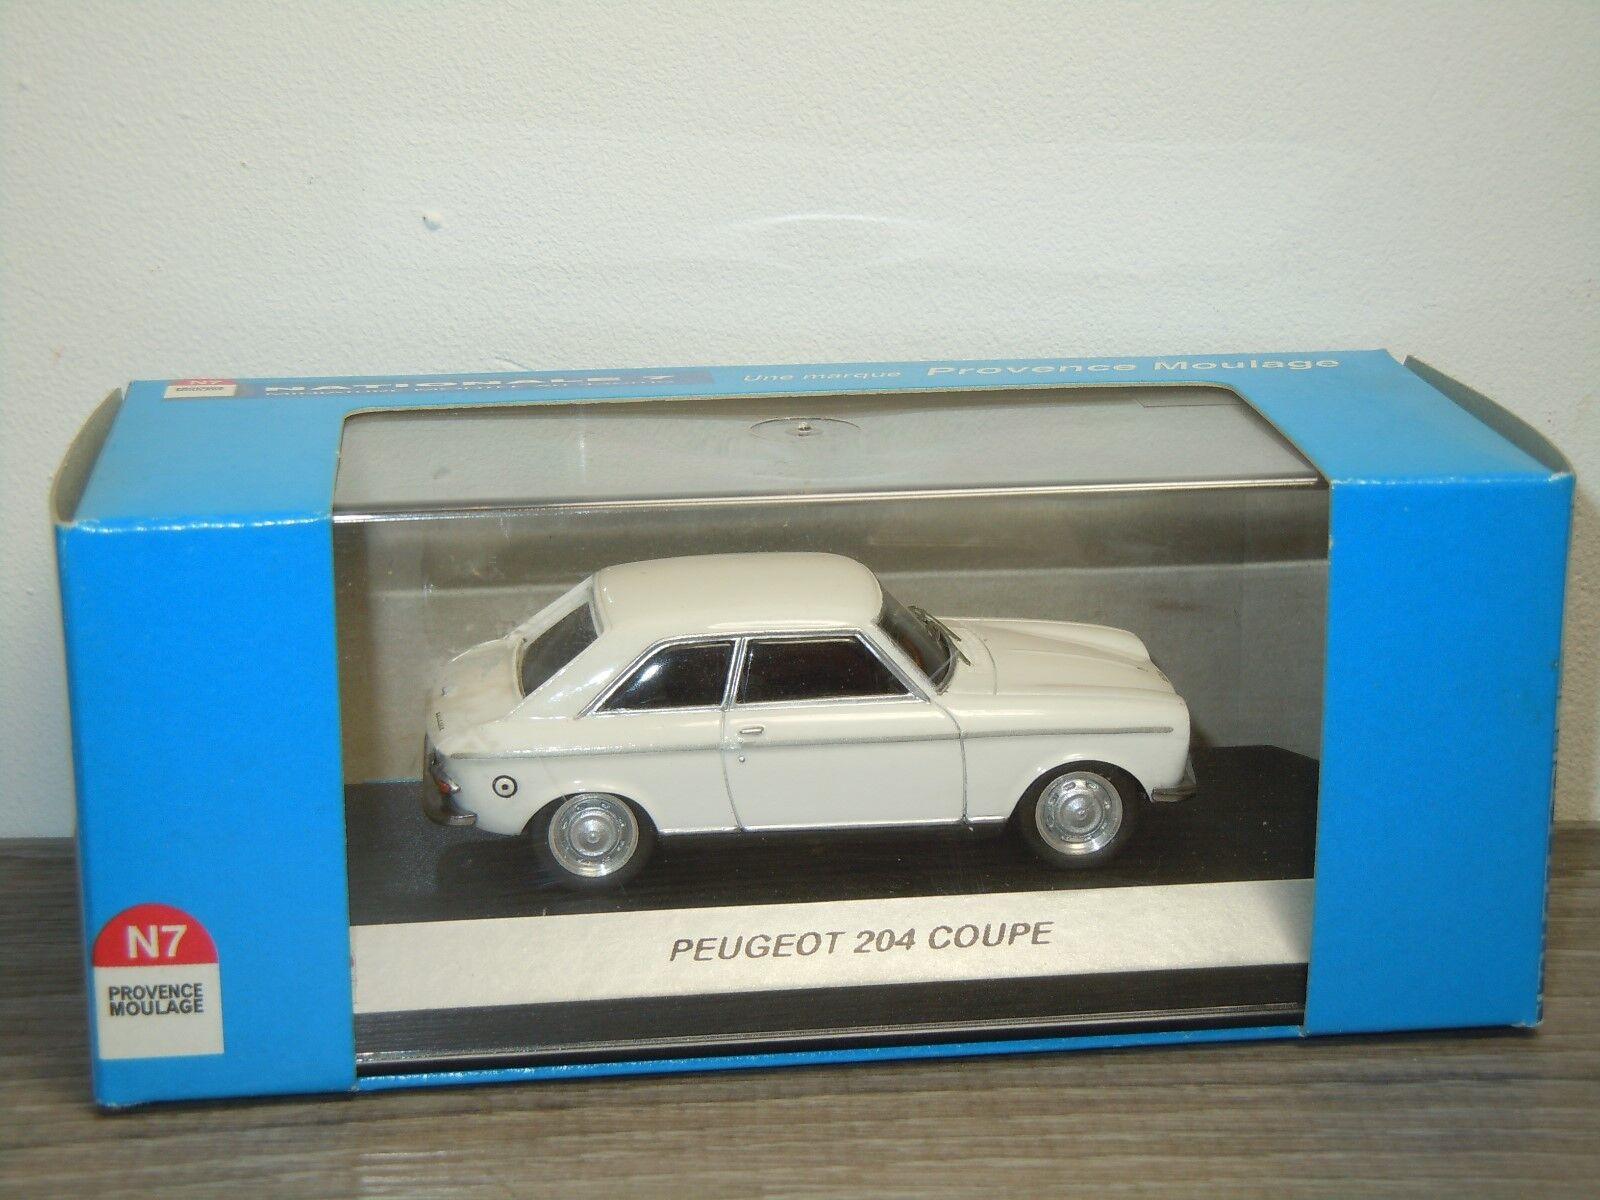 mejor oferta Peugeot 204 Coupe - Provence Moulage 1 43 in in in Box 32771  cómodamente